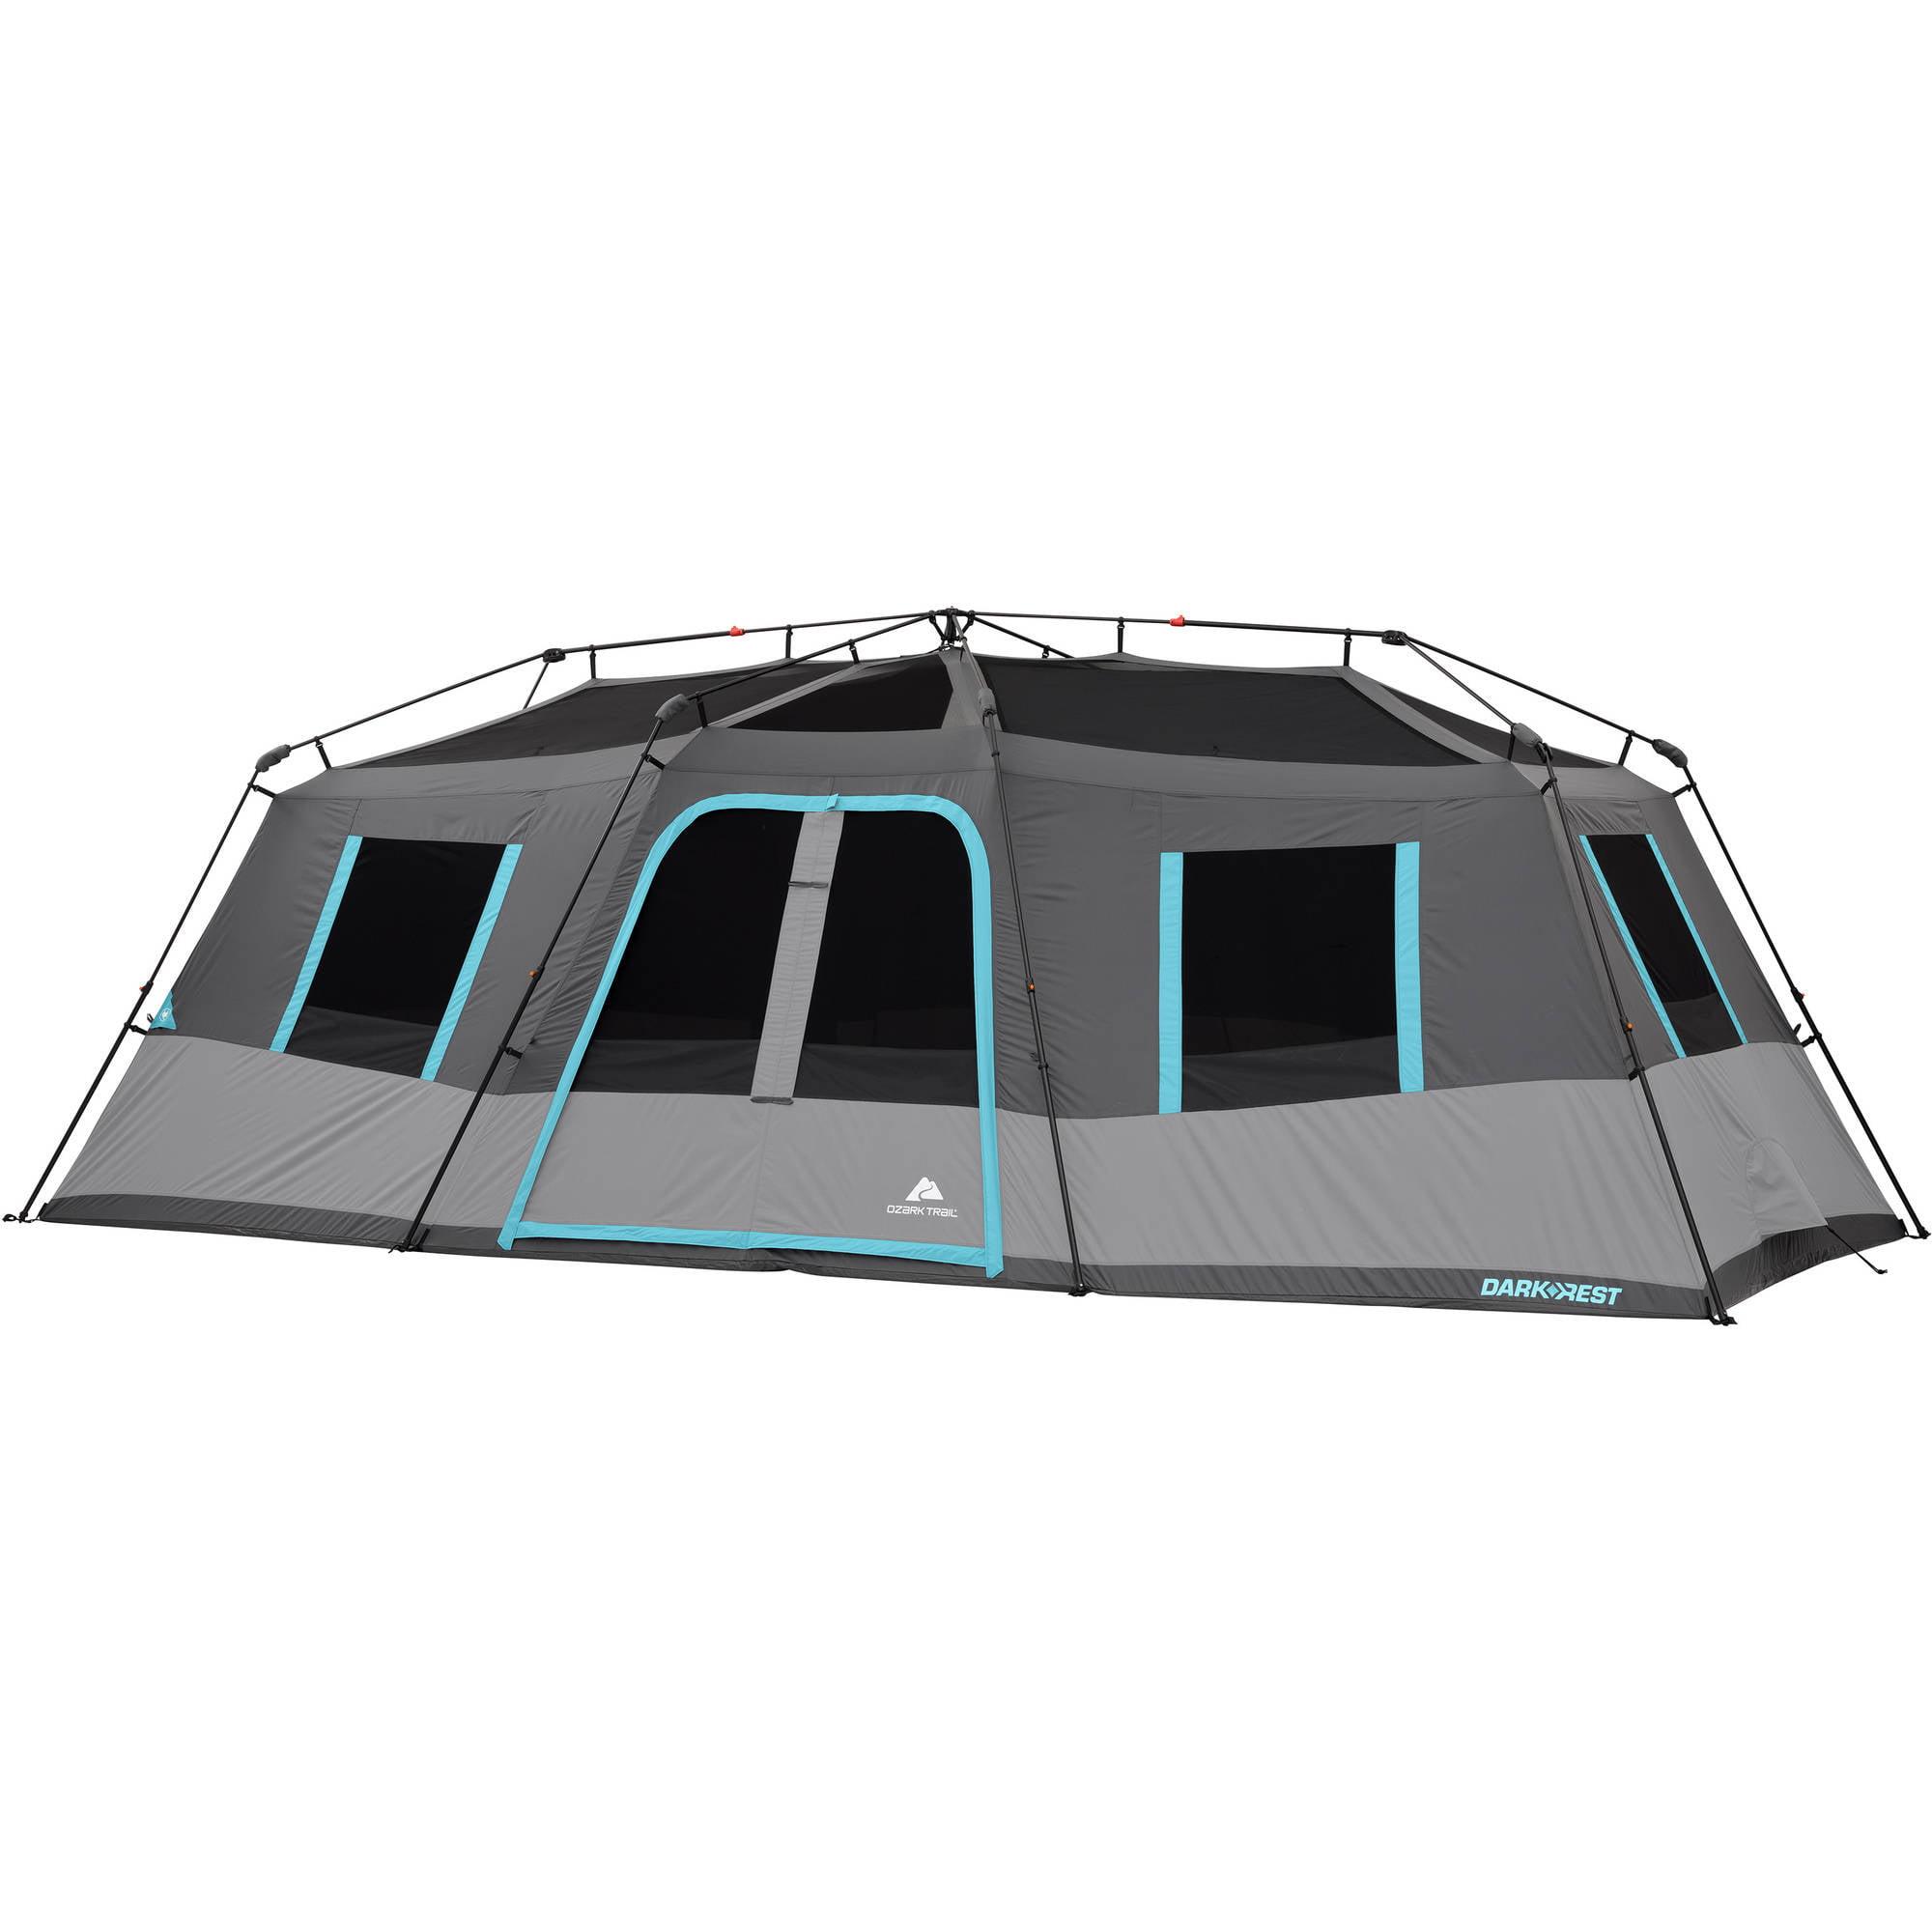 Best Ozark Trail Cabin Tent 20 X 10 Instant Dark Rest